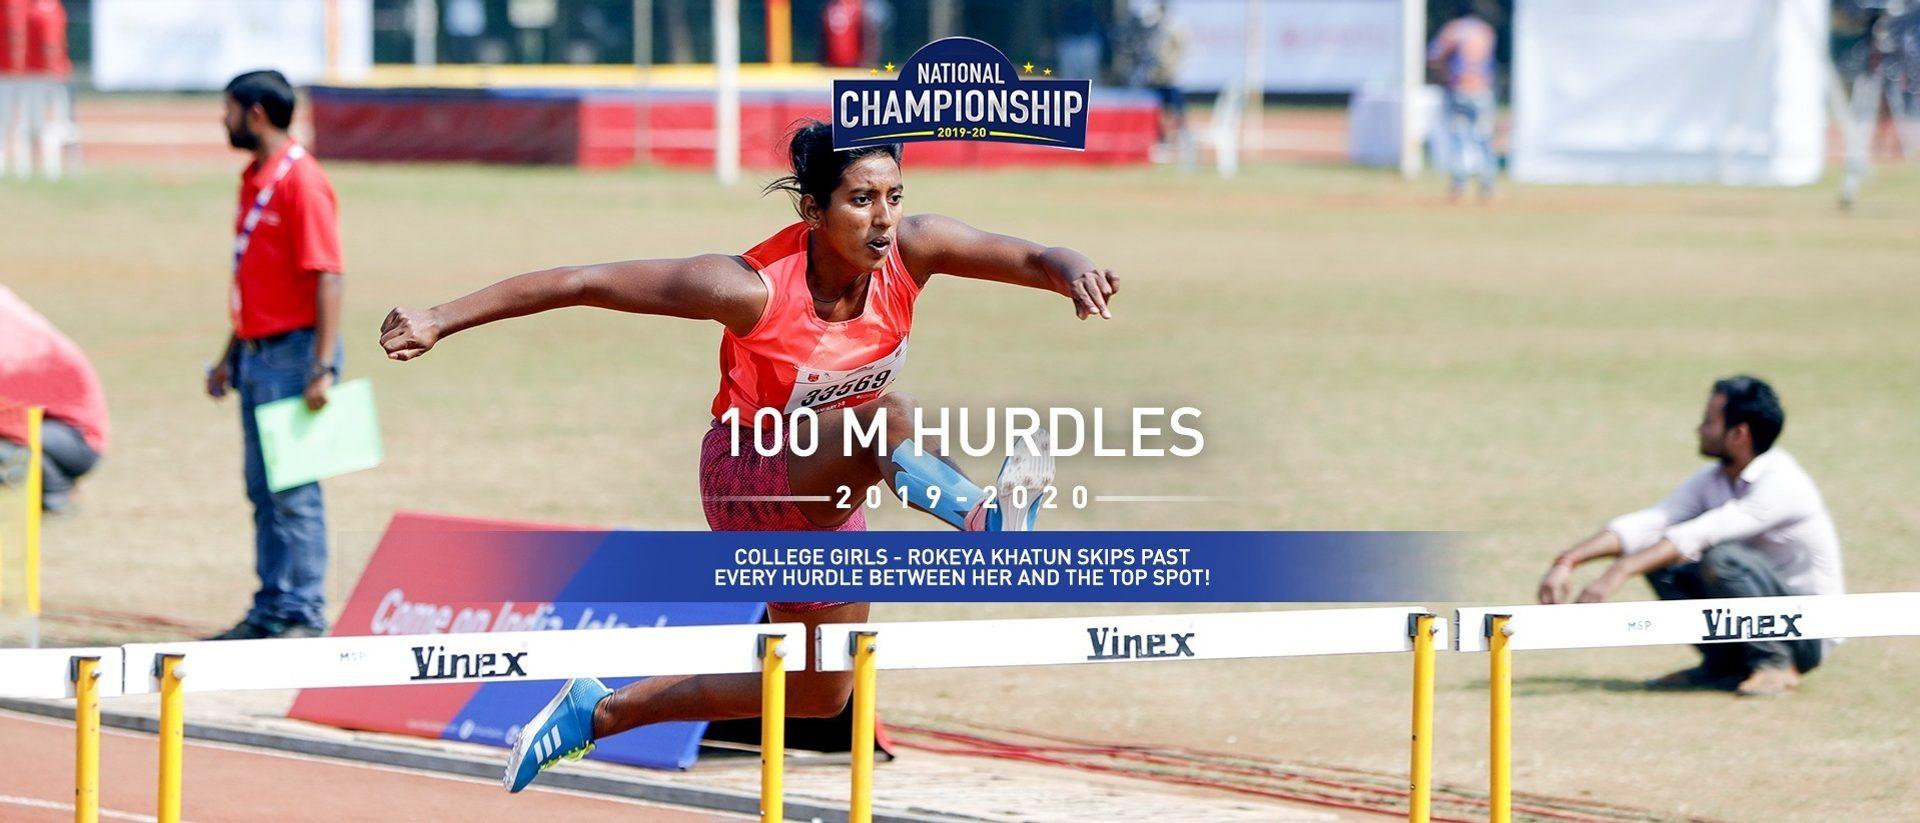 College Girls: Rokeya Khatun wins Gold with a dominating performance!